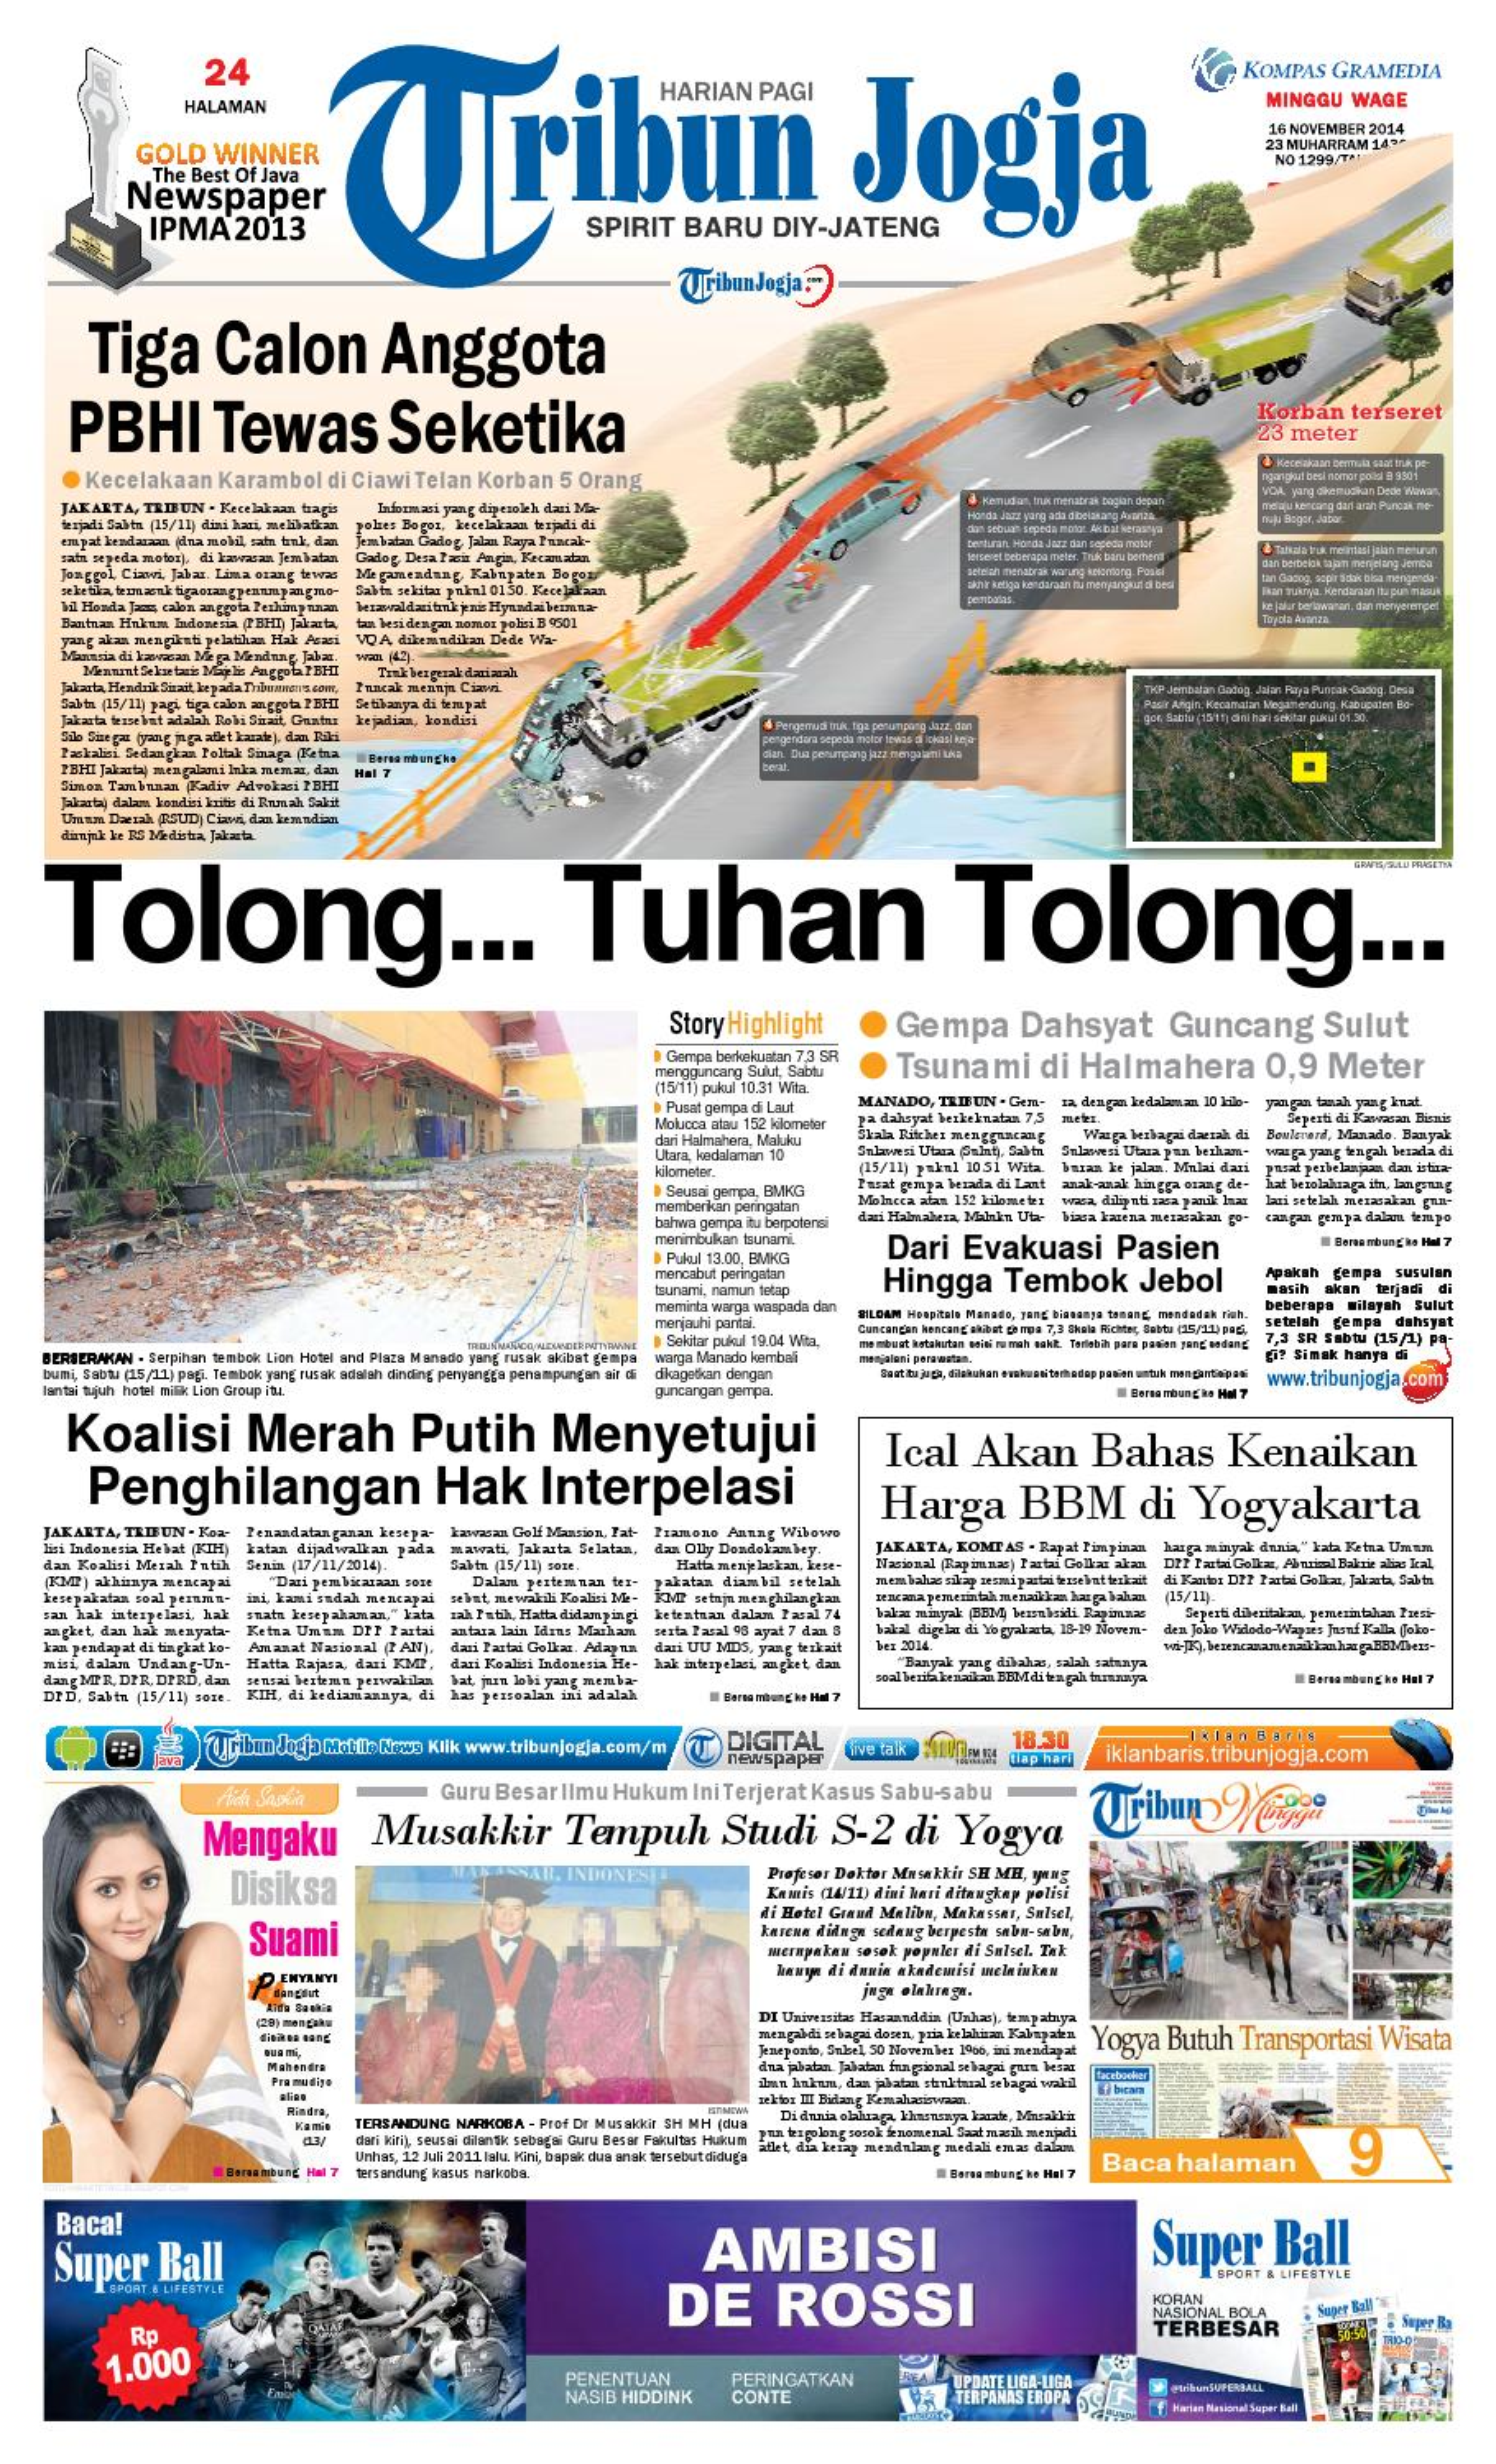 Tribunjogja 16 11 2014 By Tribun Jogja Issuu Kacamata Safety Kerja Motor Kings Ky 713 Original